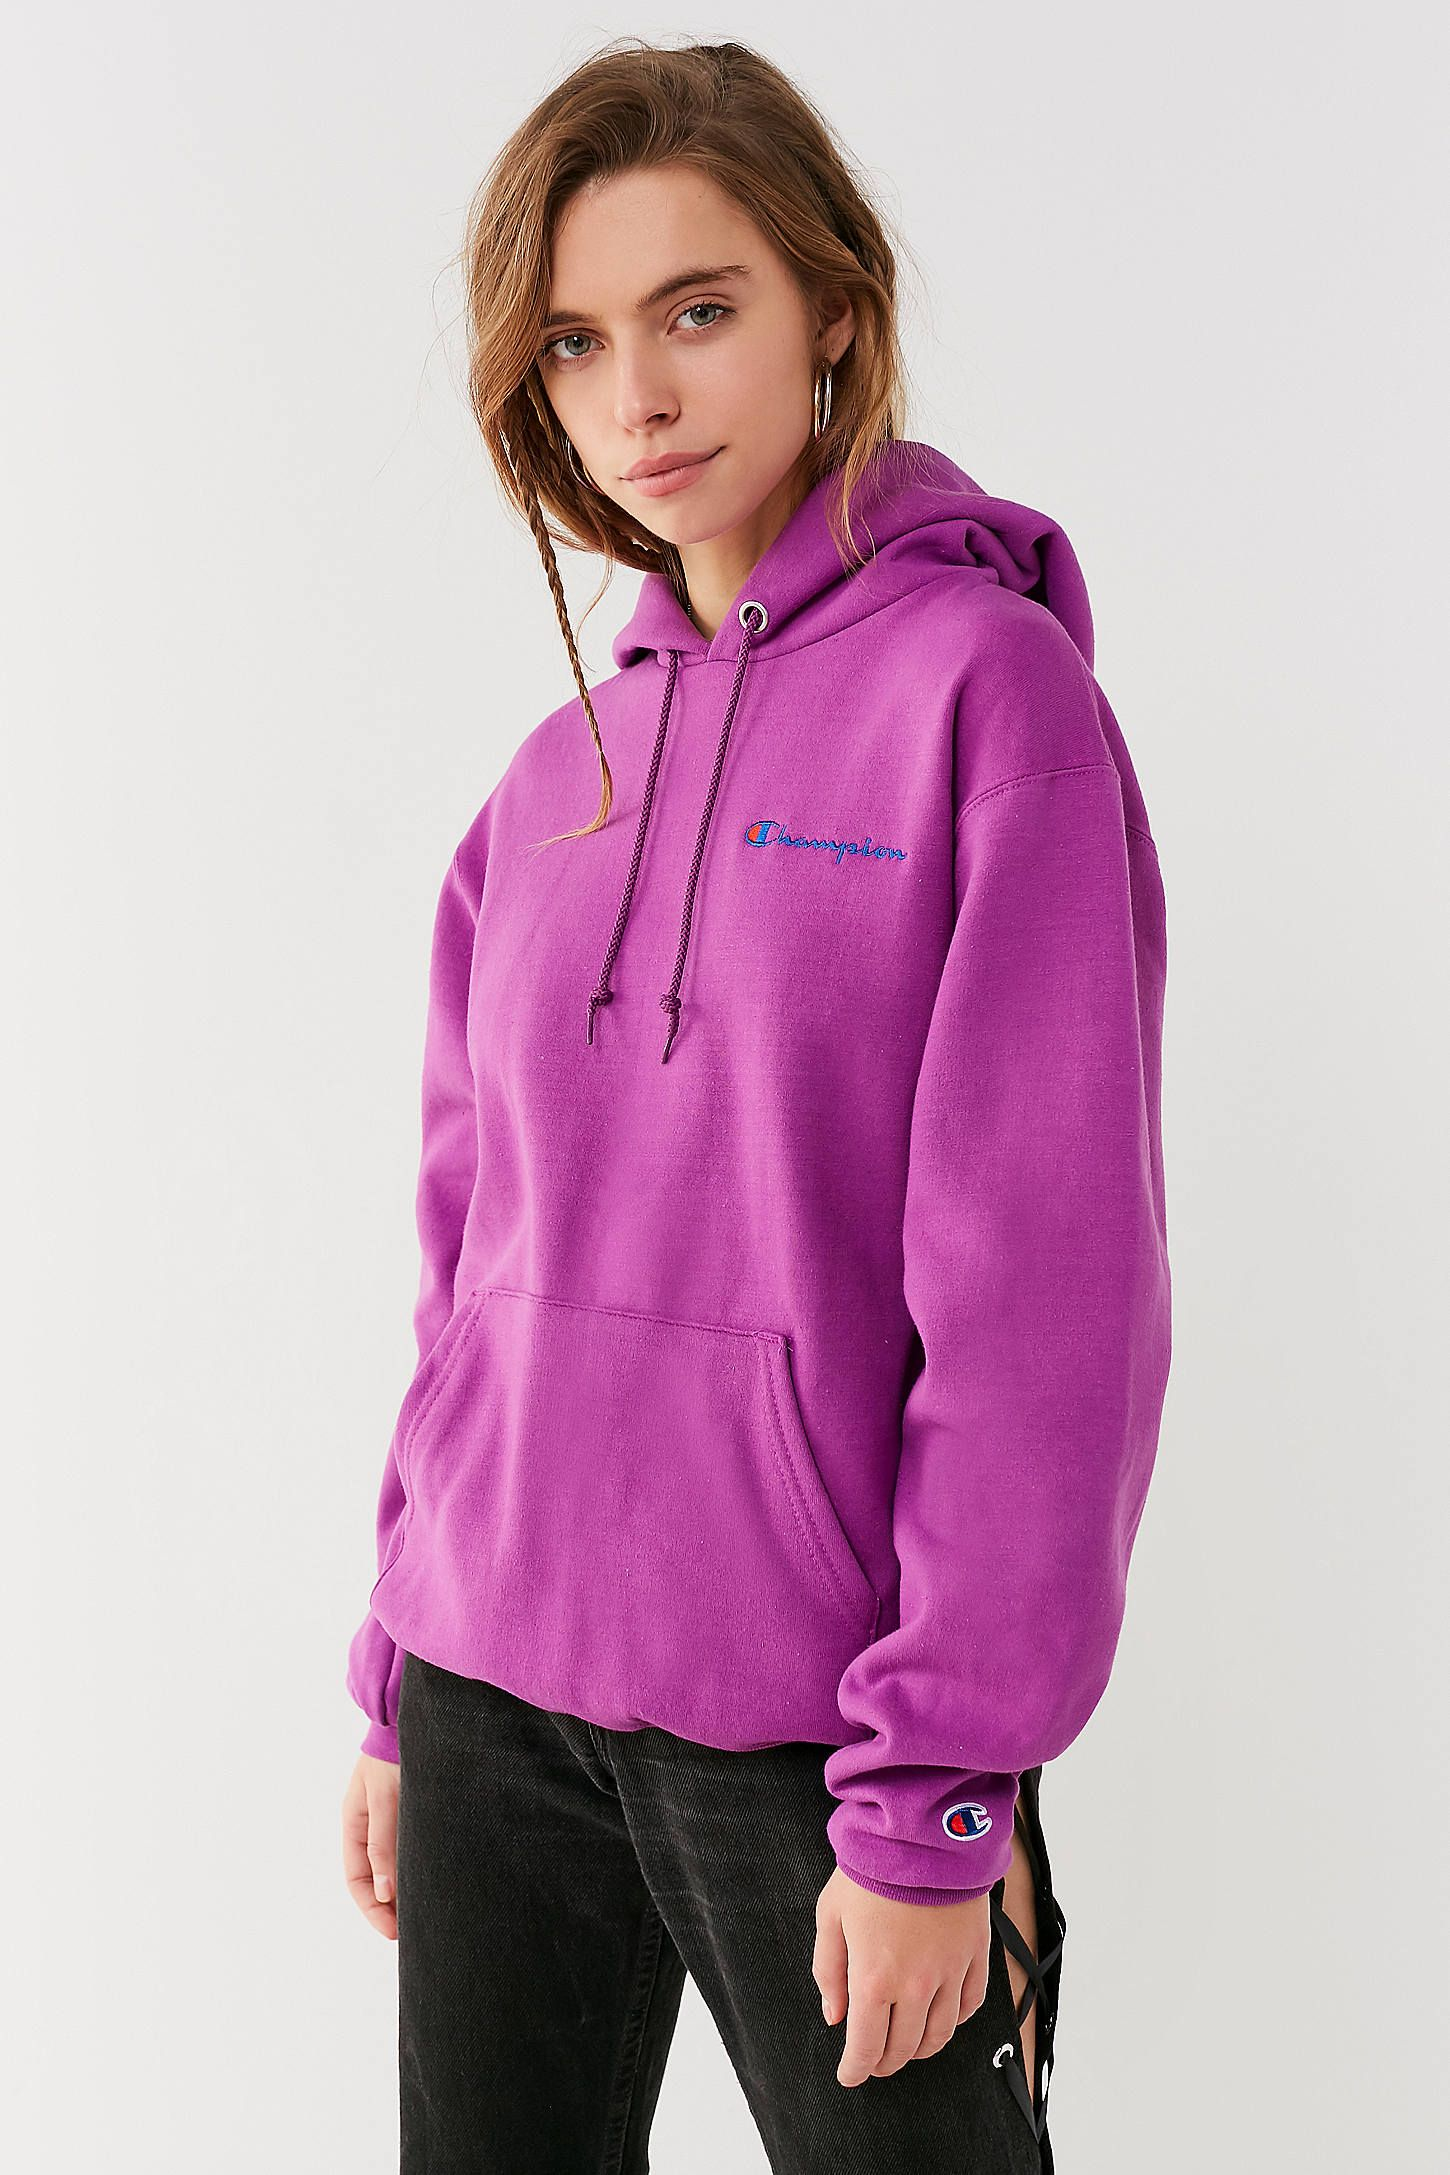 Champion Uo Reverse Weave Mini Logo Hoodie Sweatshirt Sweatshirts Hoodie Sweatshirts Hoodies [ 2175 x 1450 Pixel ]